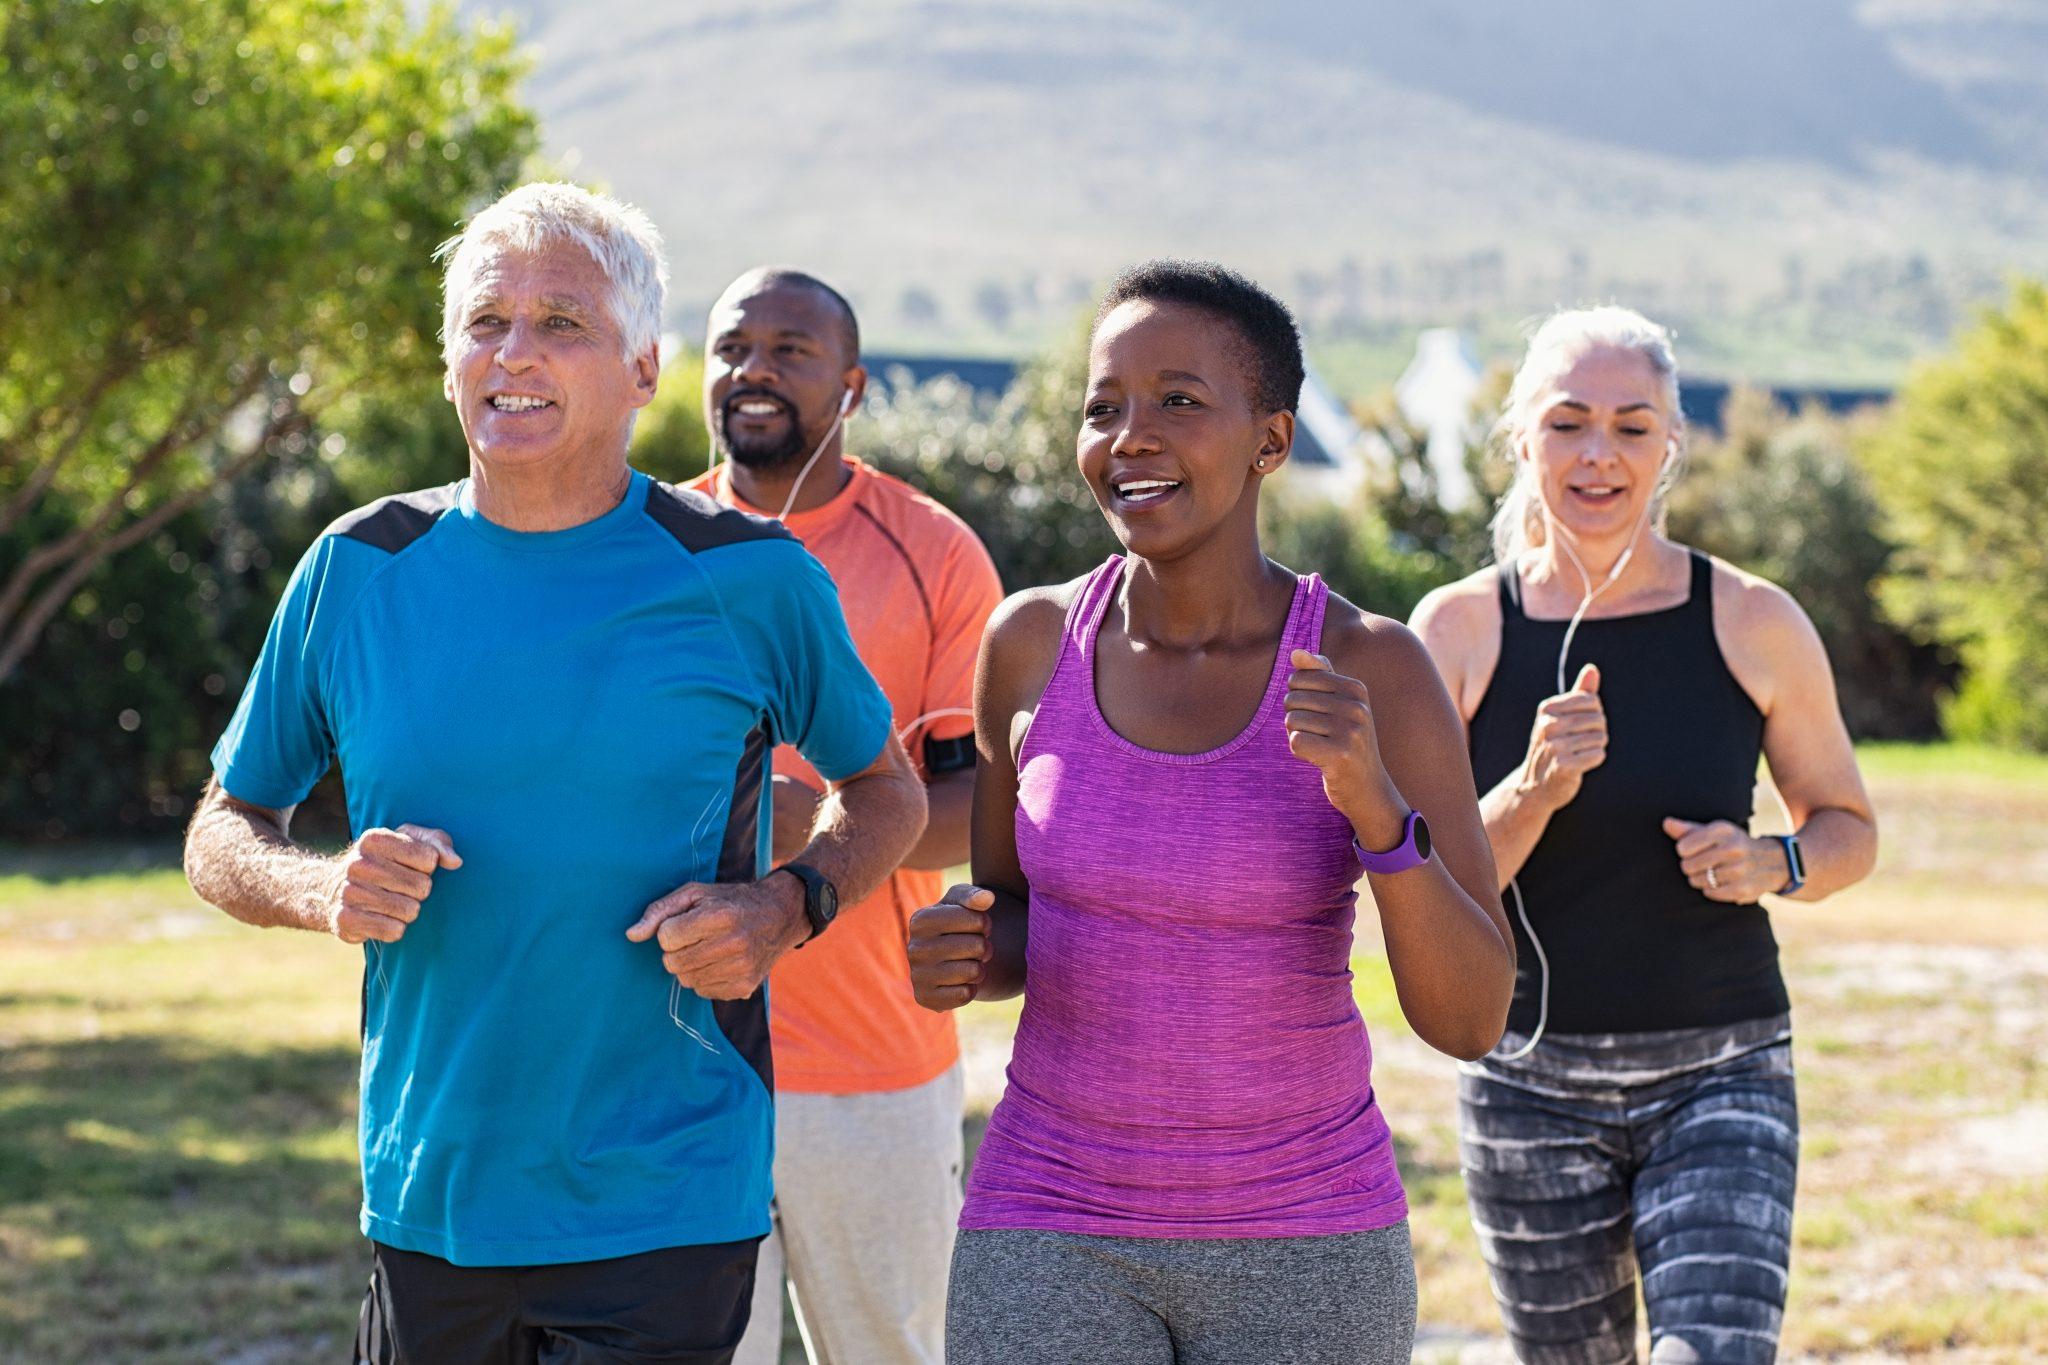 Mature and senior people jogging at park